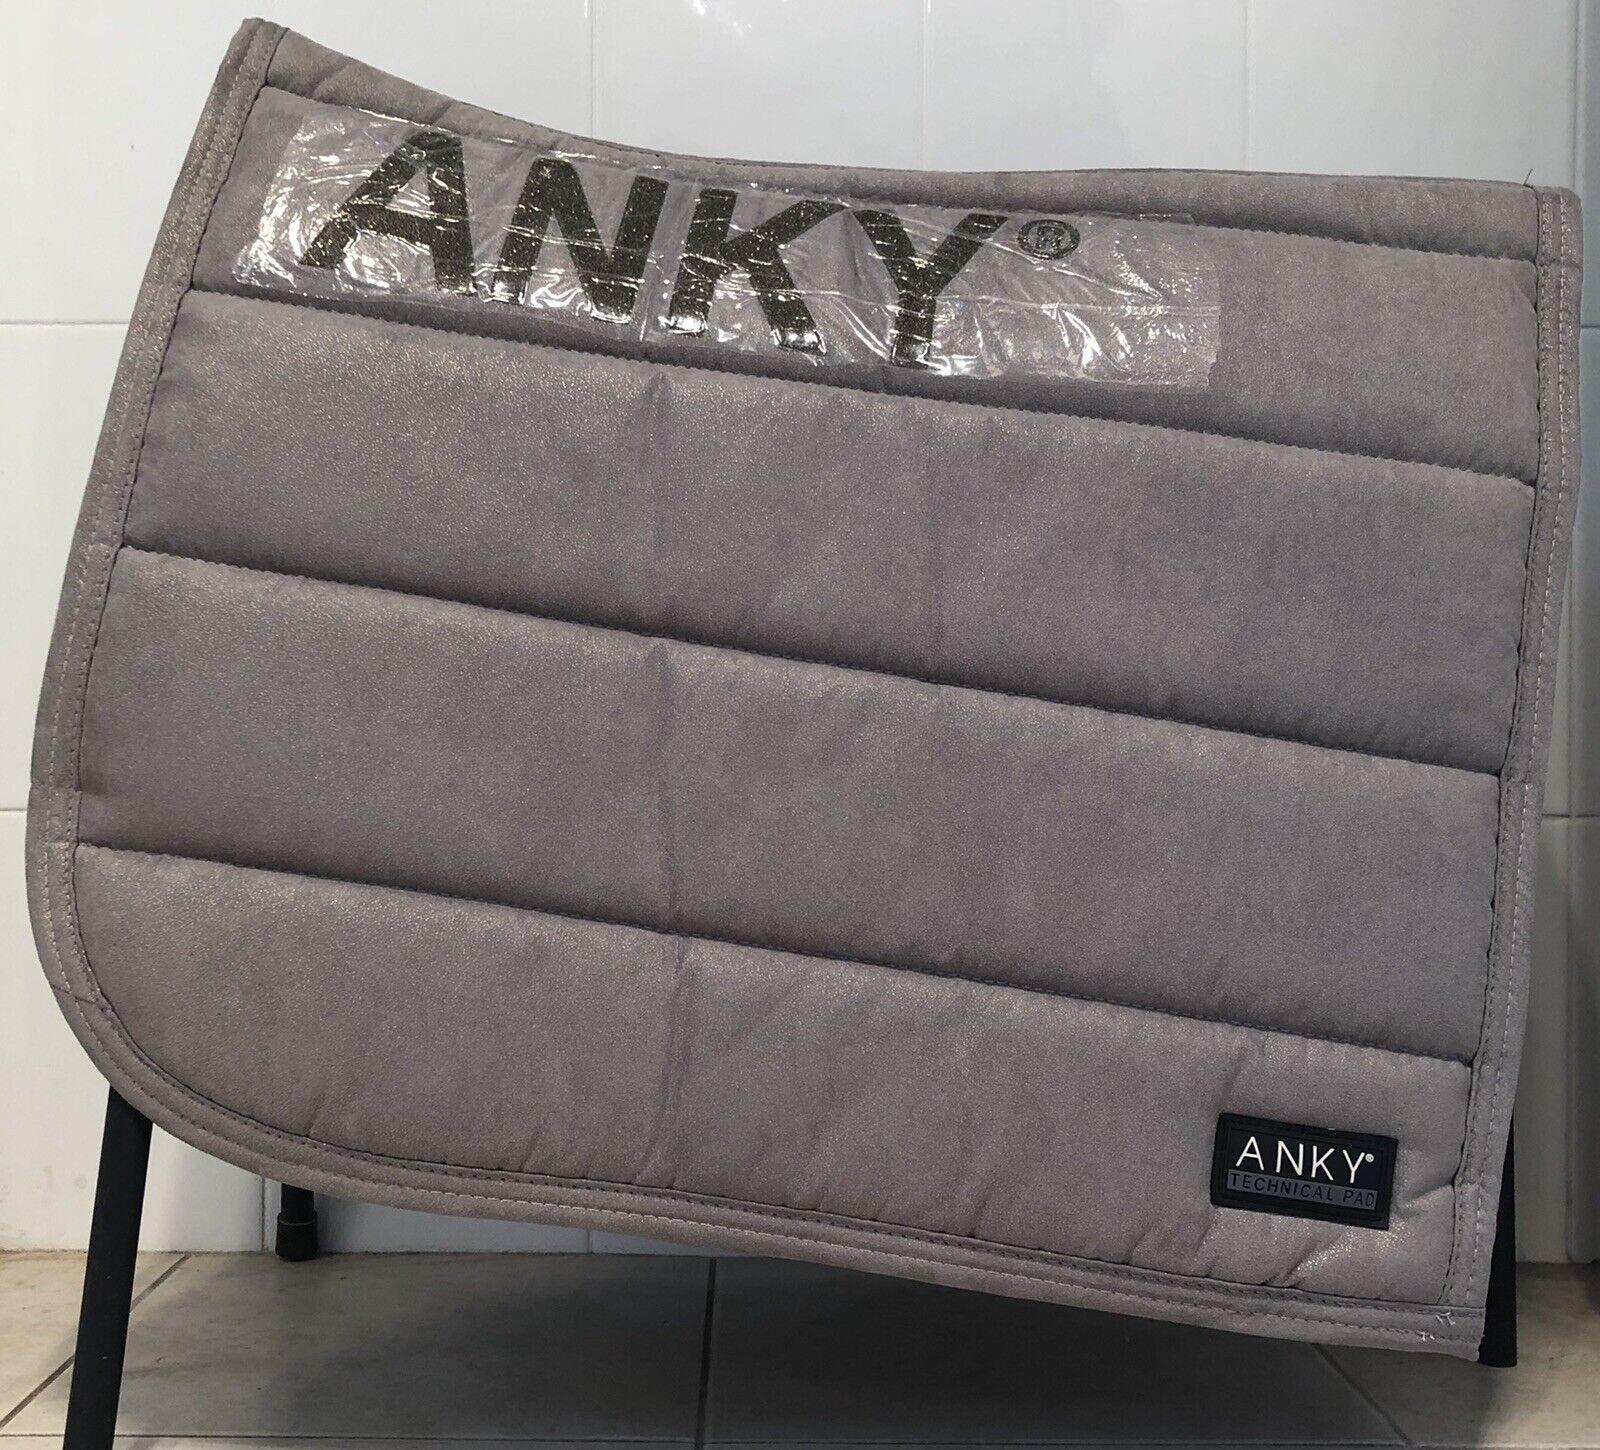 ANKY Light Gold Glitter Saddle Pad Brand New AU FREE POST